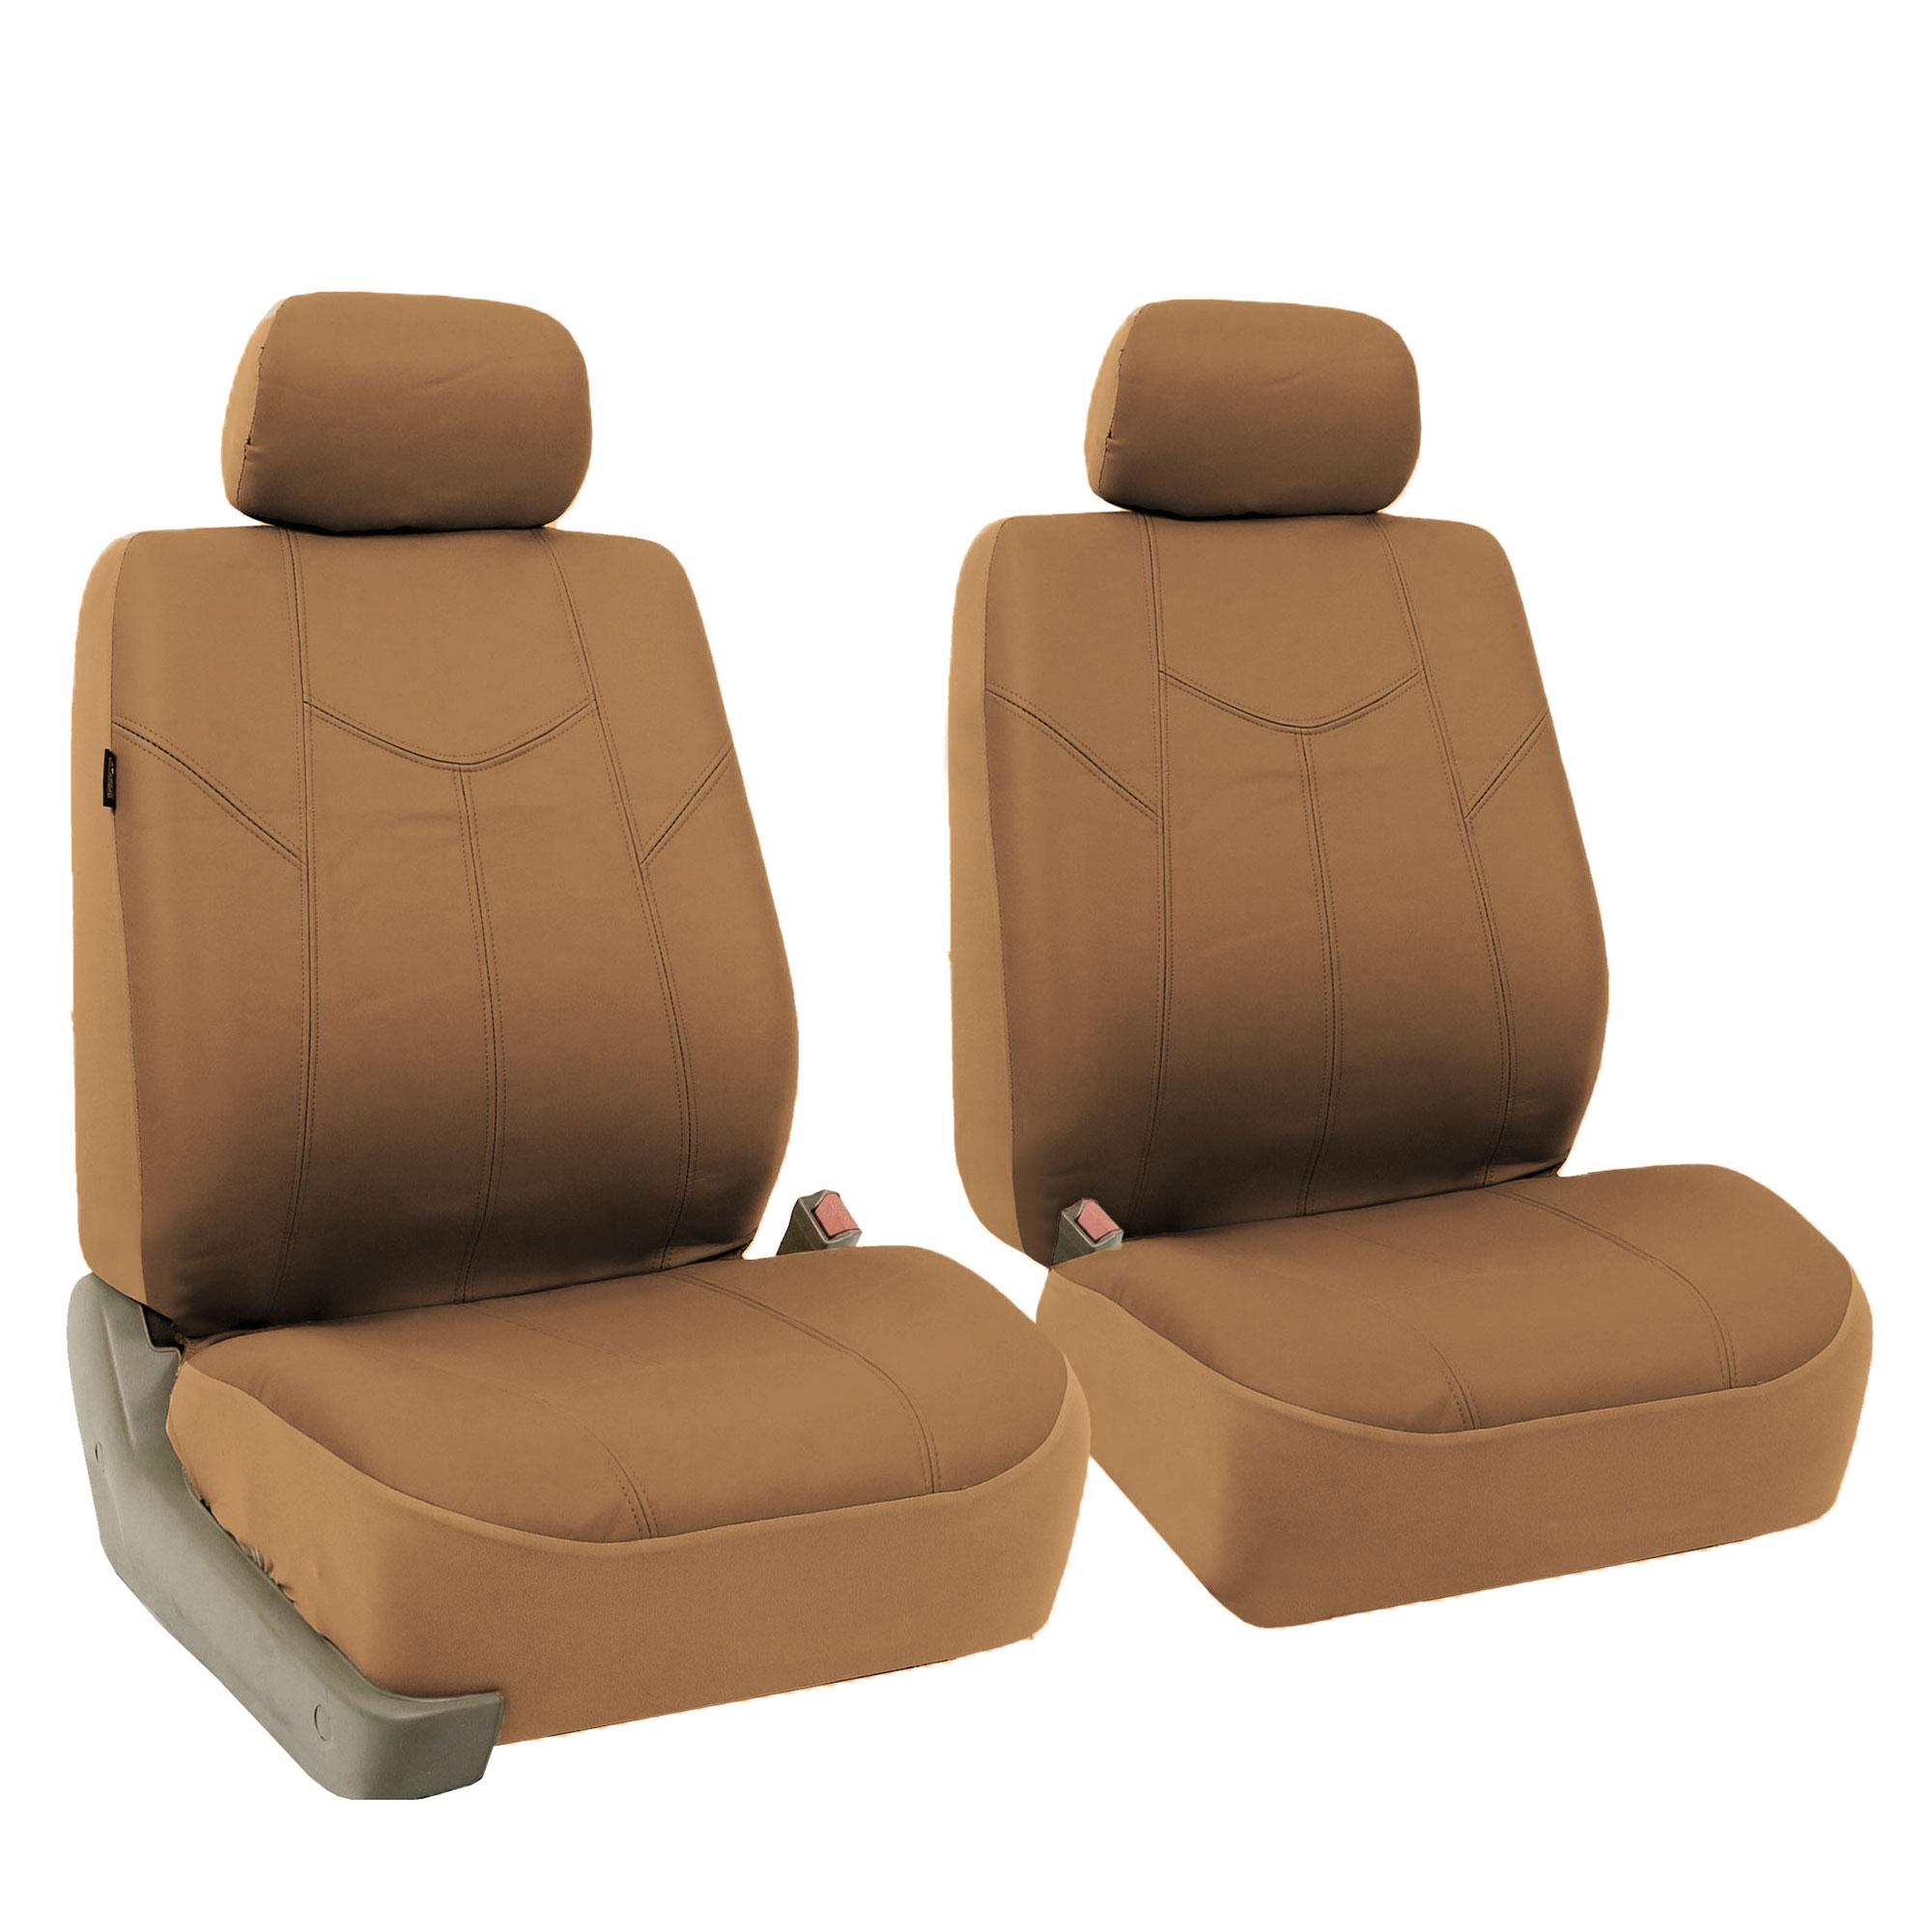 Black Tan Pu Leather Car Seat Cover Set Headrests Floor Mat Set